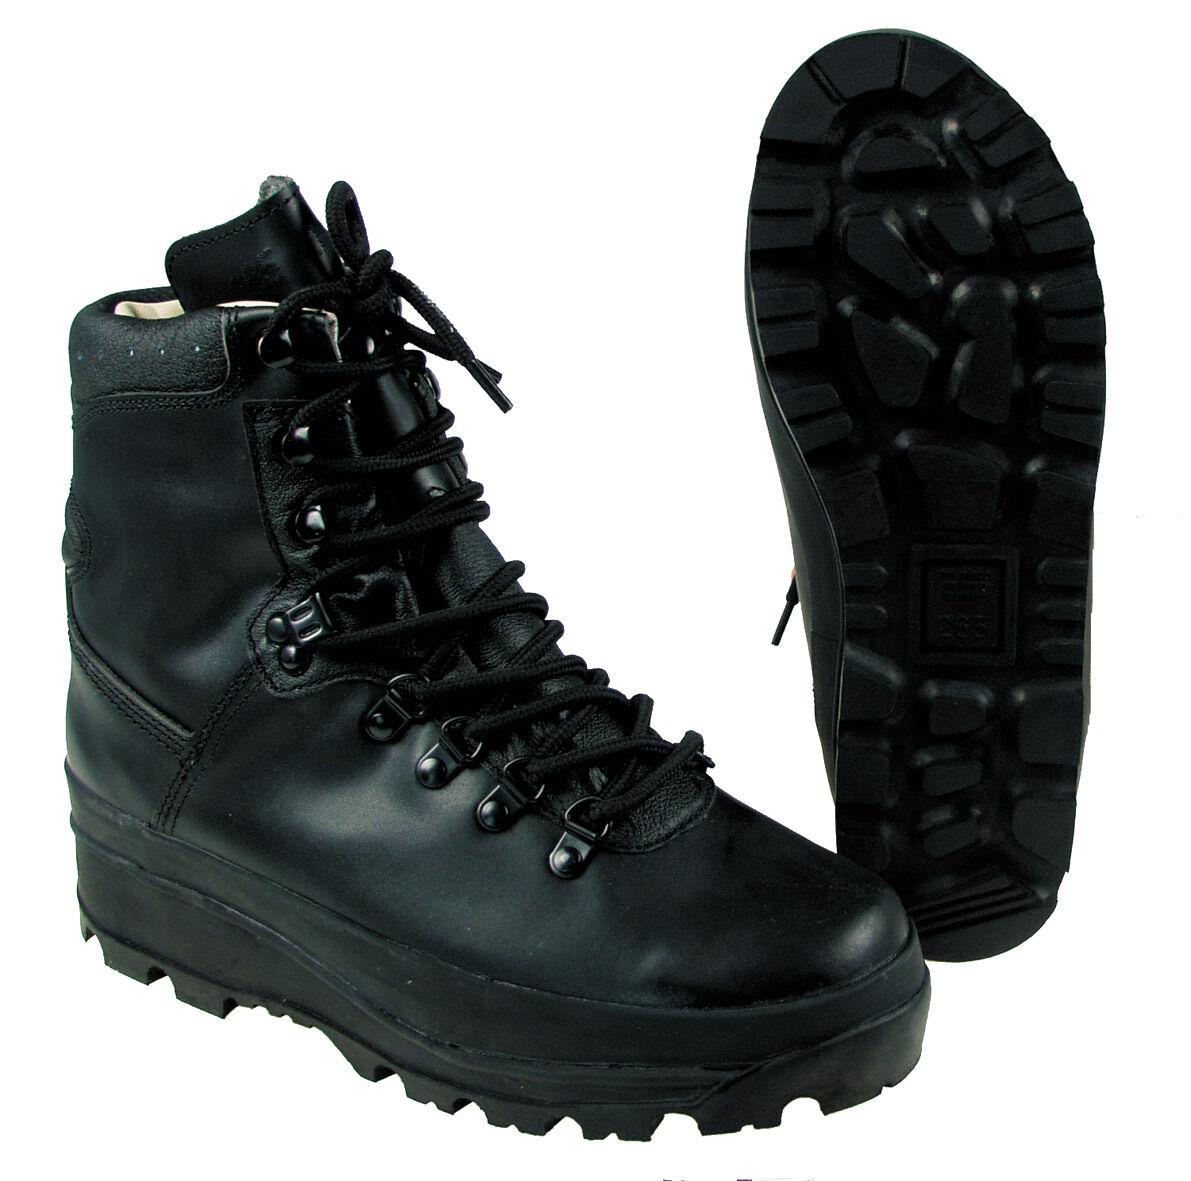 MFH MONTAÑA BW ZAPATOS breathtex Bundeswehr botas de cuero zapatos botas negro 39-48